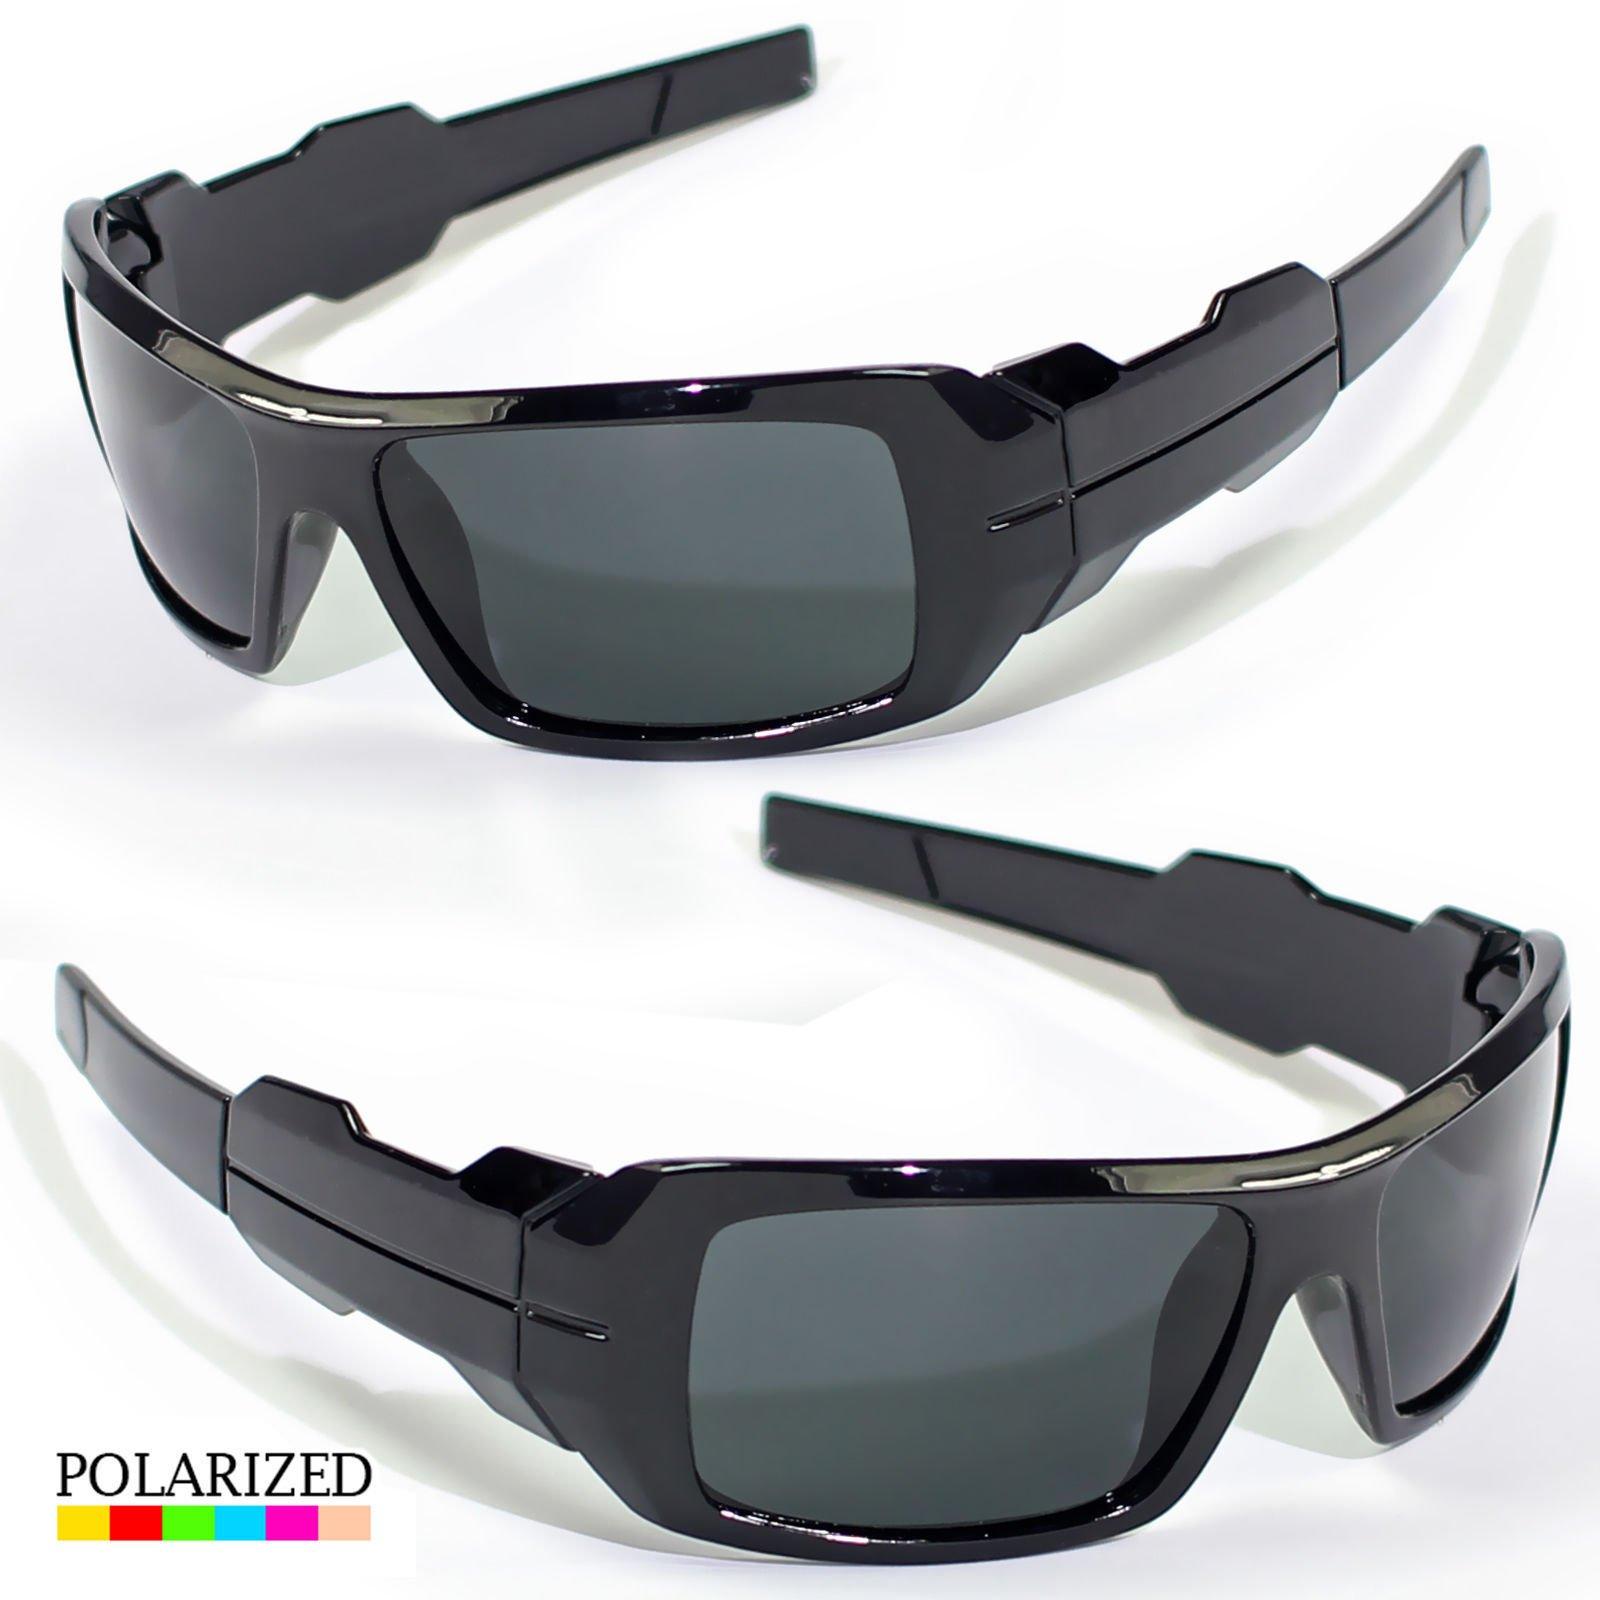 New Black Polarized Wrap Around Mens Glasses Sports Eyewear Driving Sunglasses